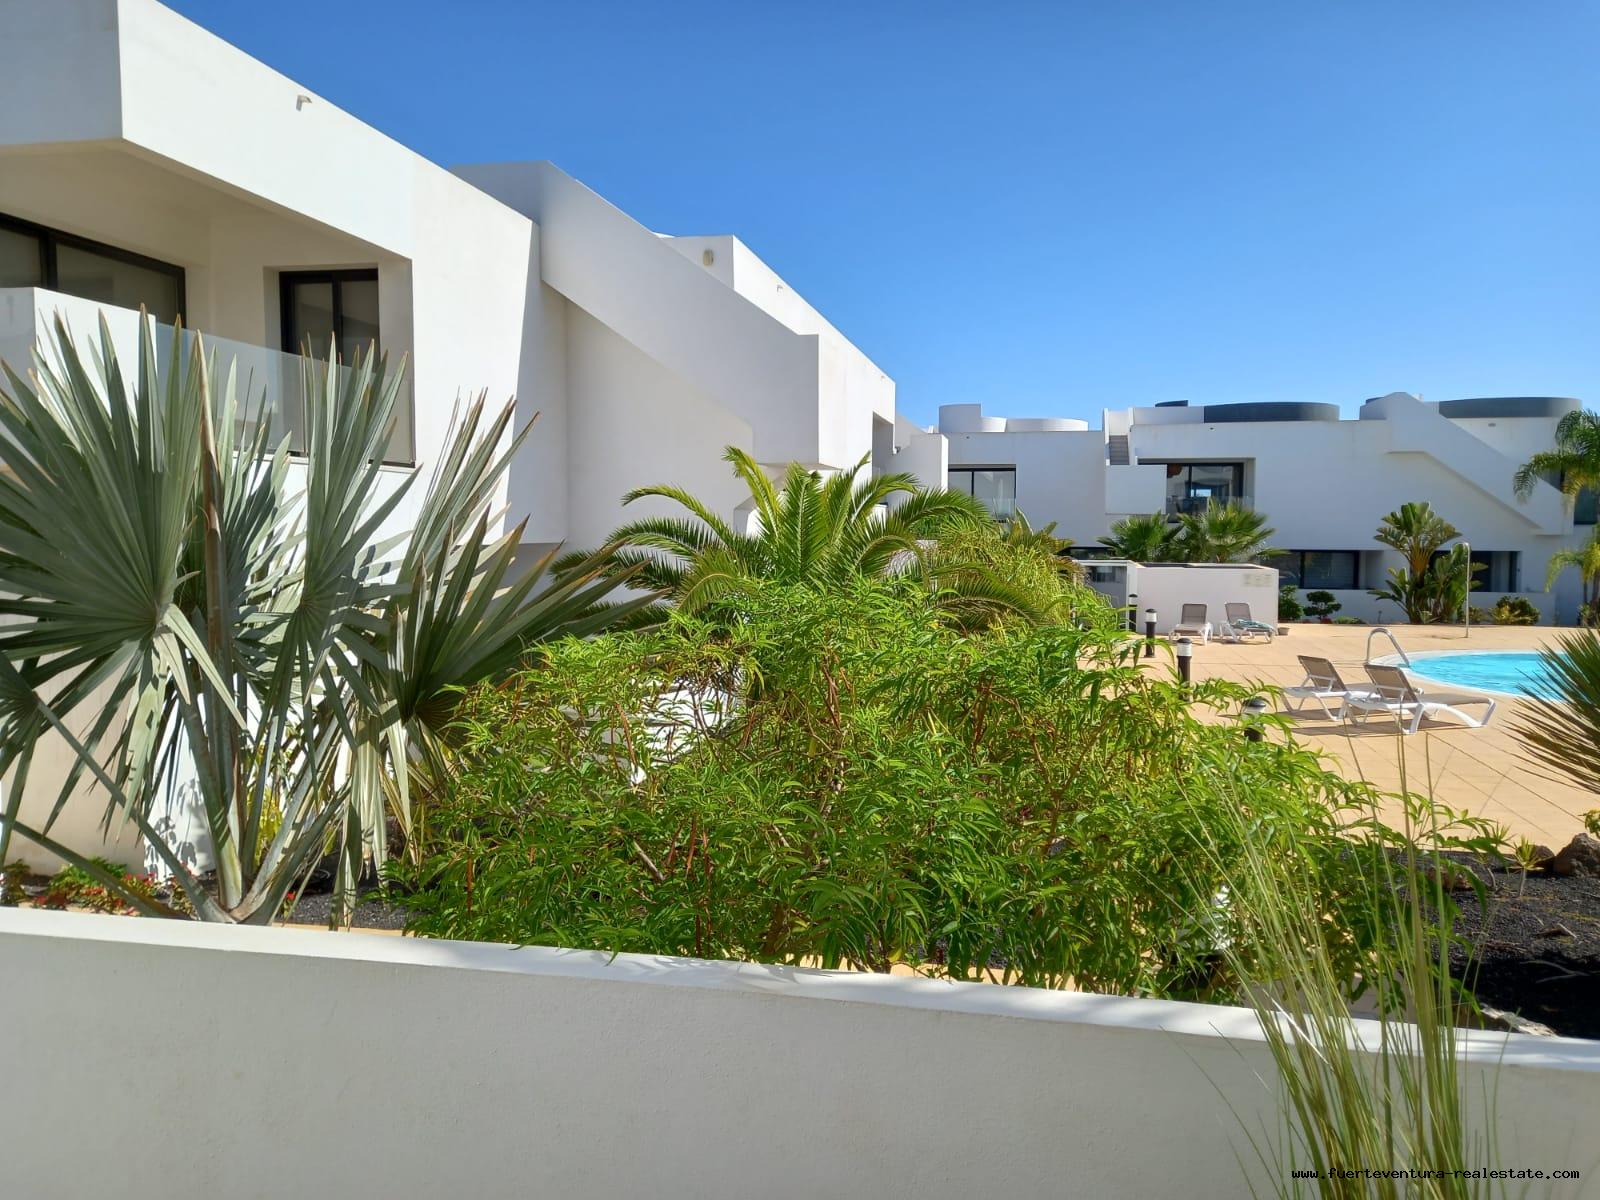 Apartment for sale at Casillas de Costa Villaverde